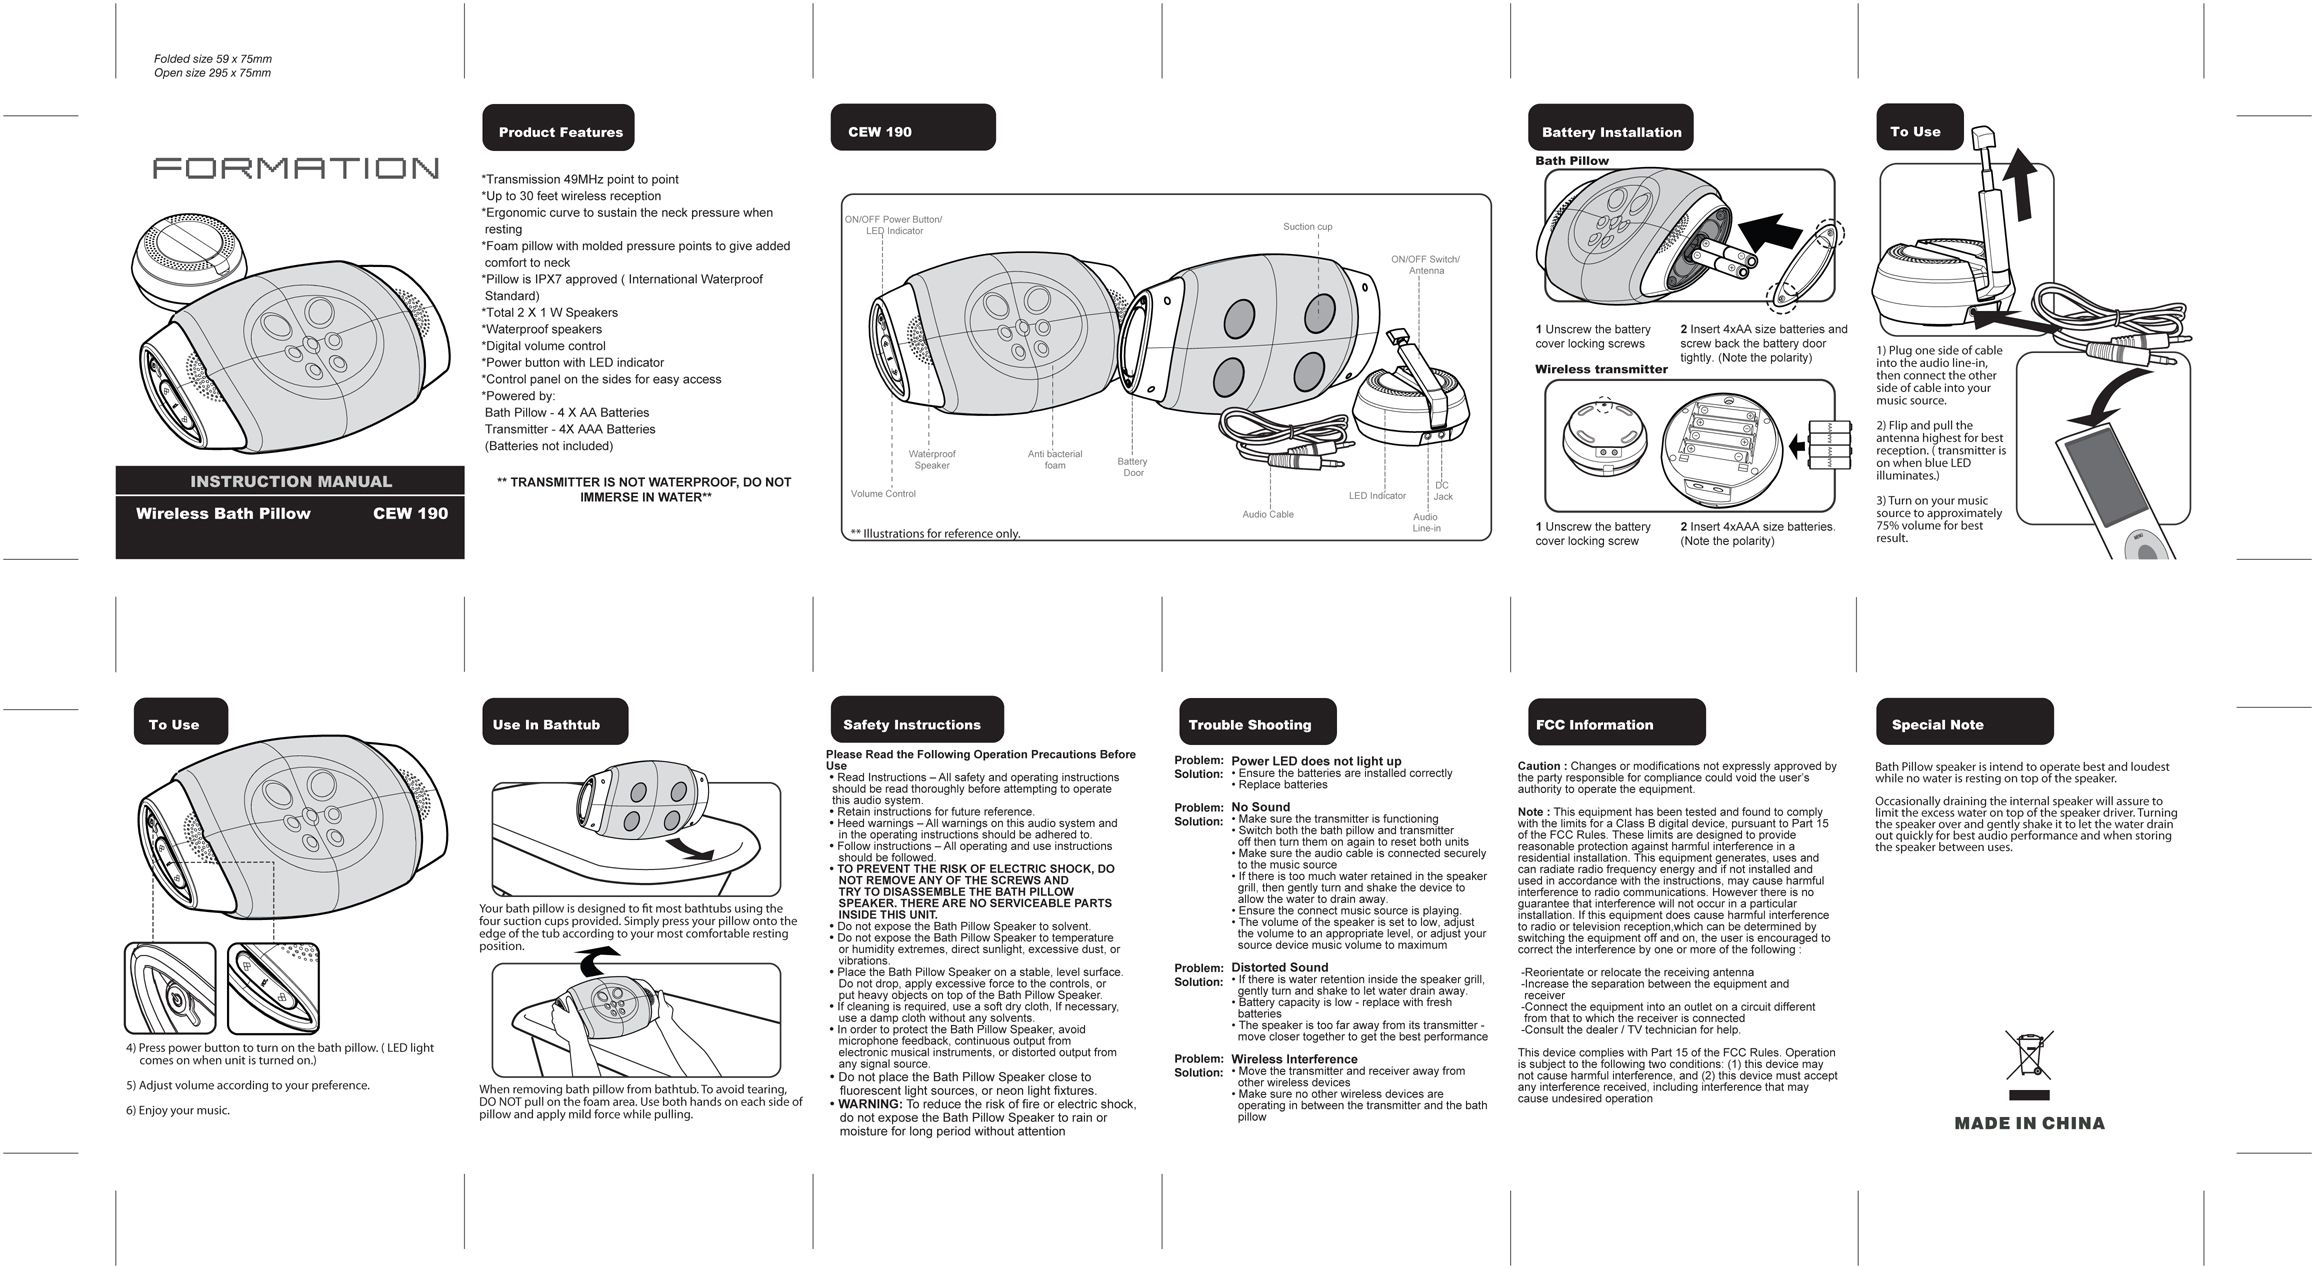 sample instruction manual layout format